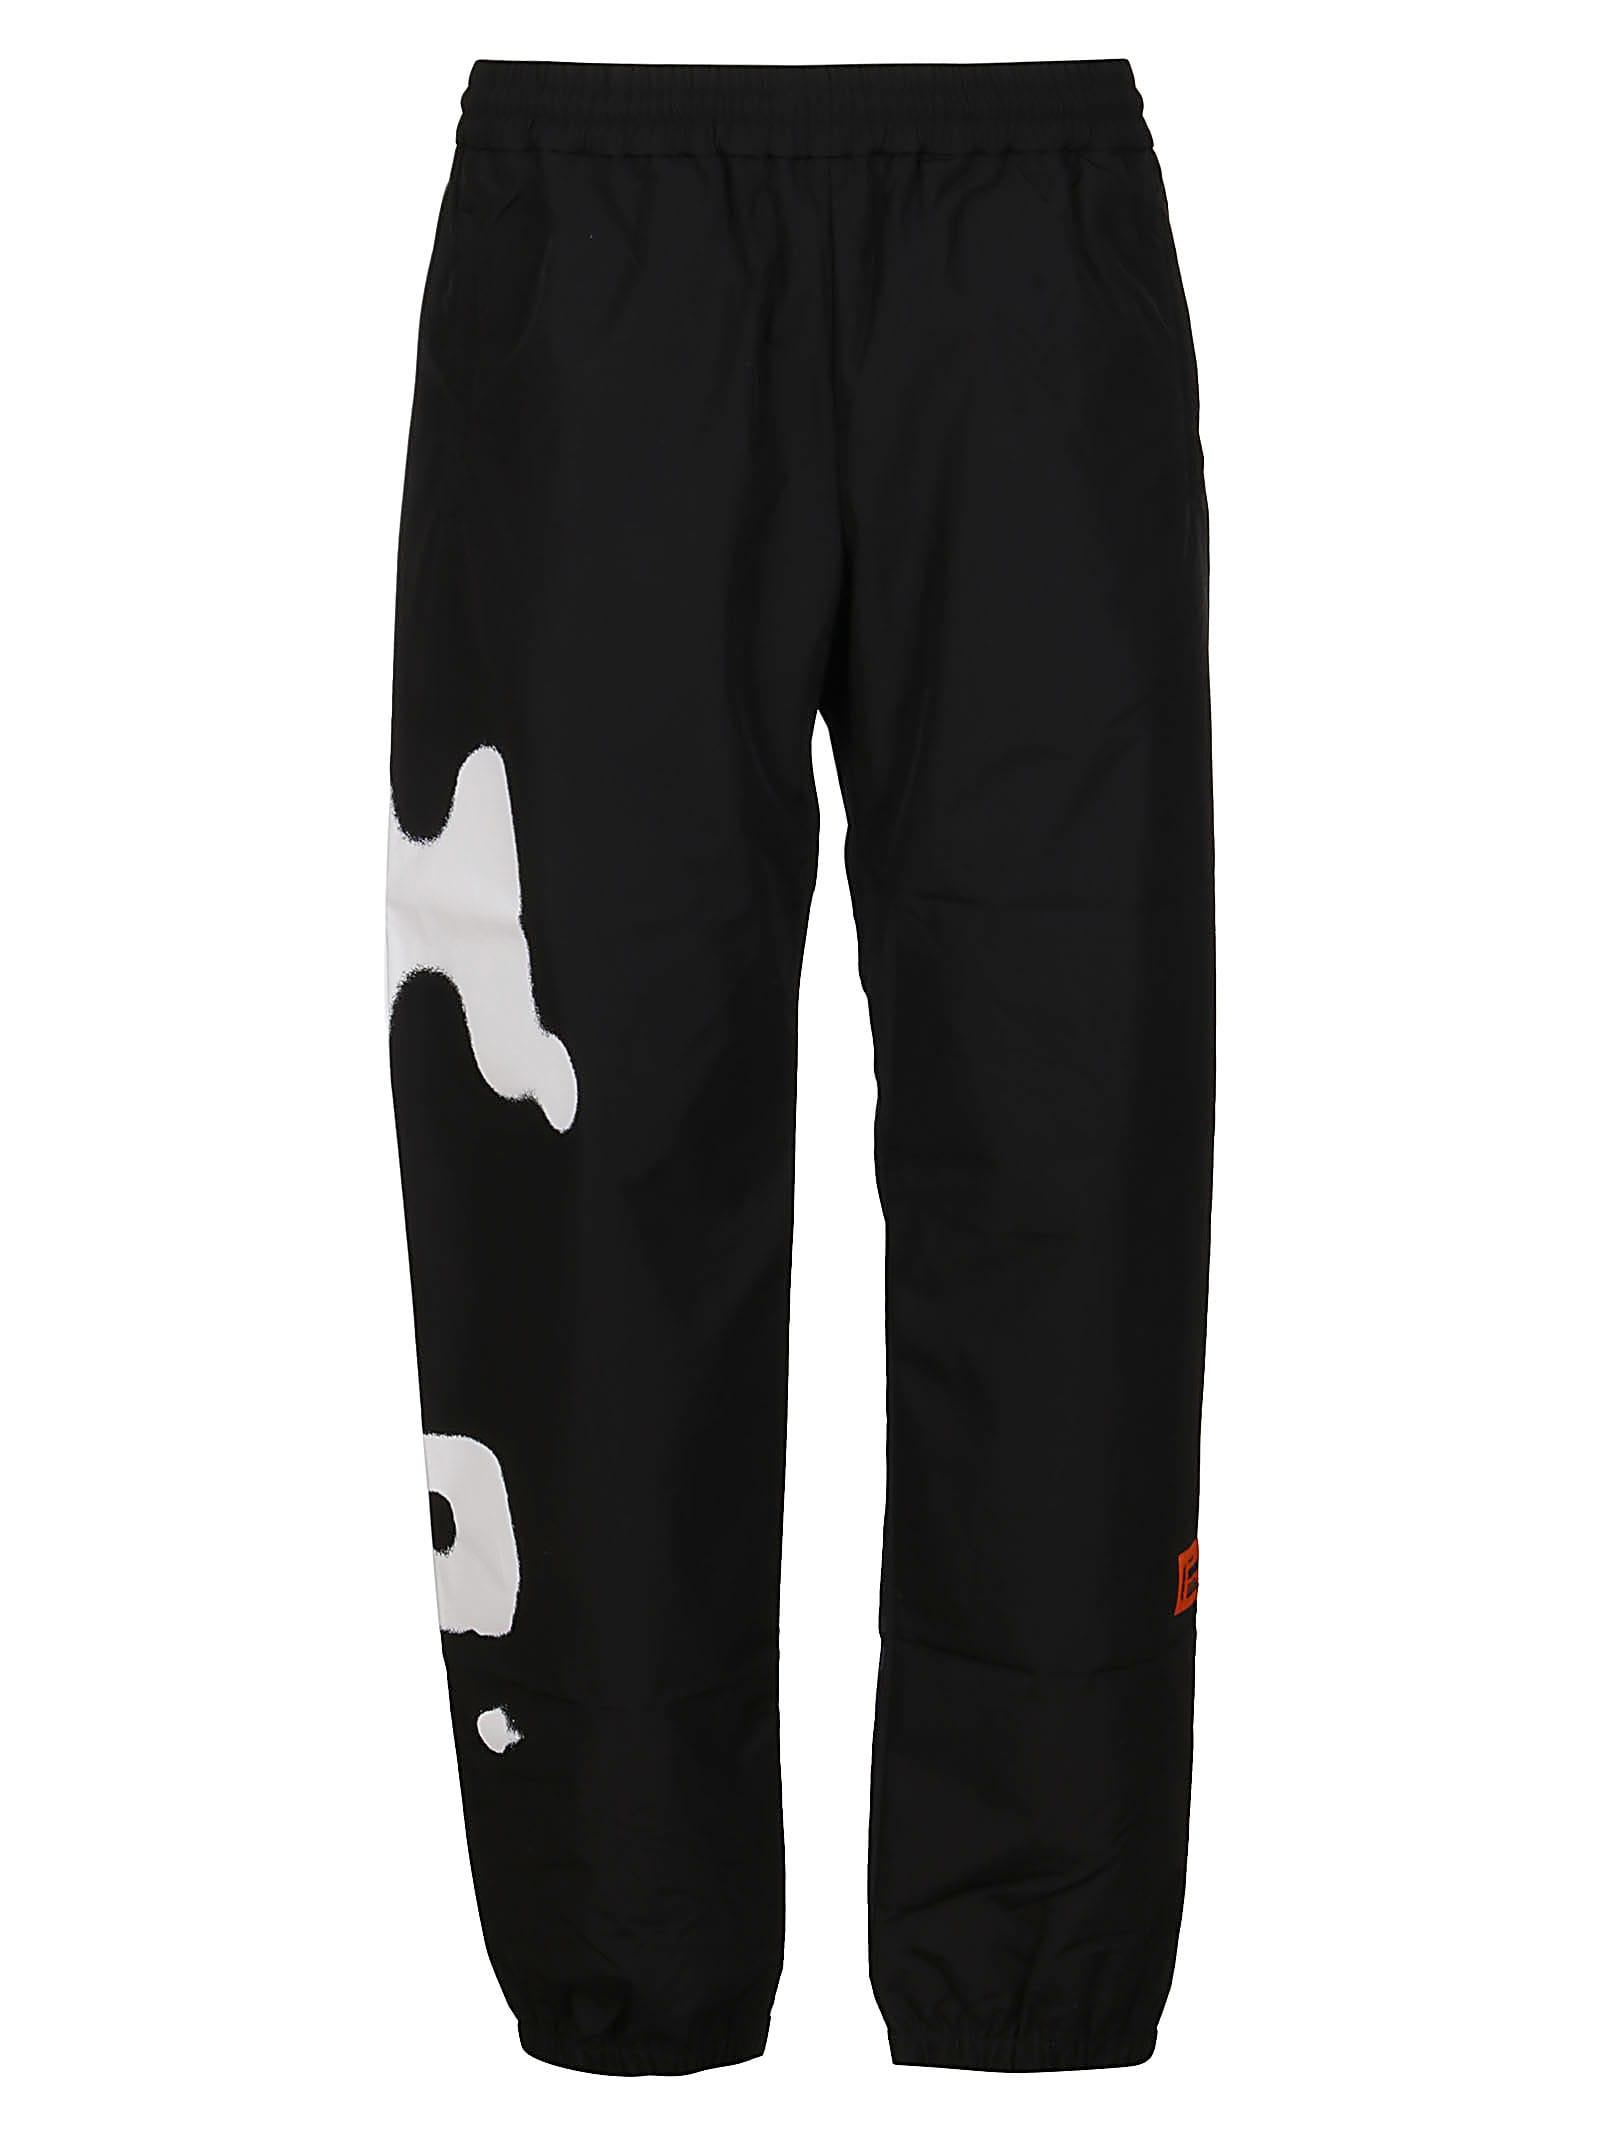 HERON PRESTON Black Cotton Track Pants